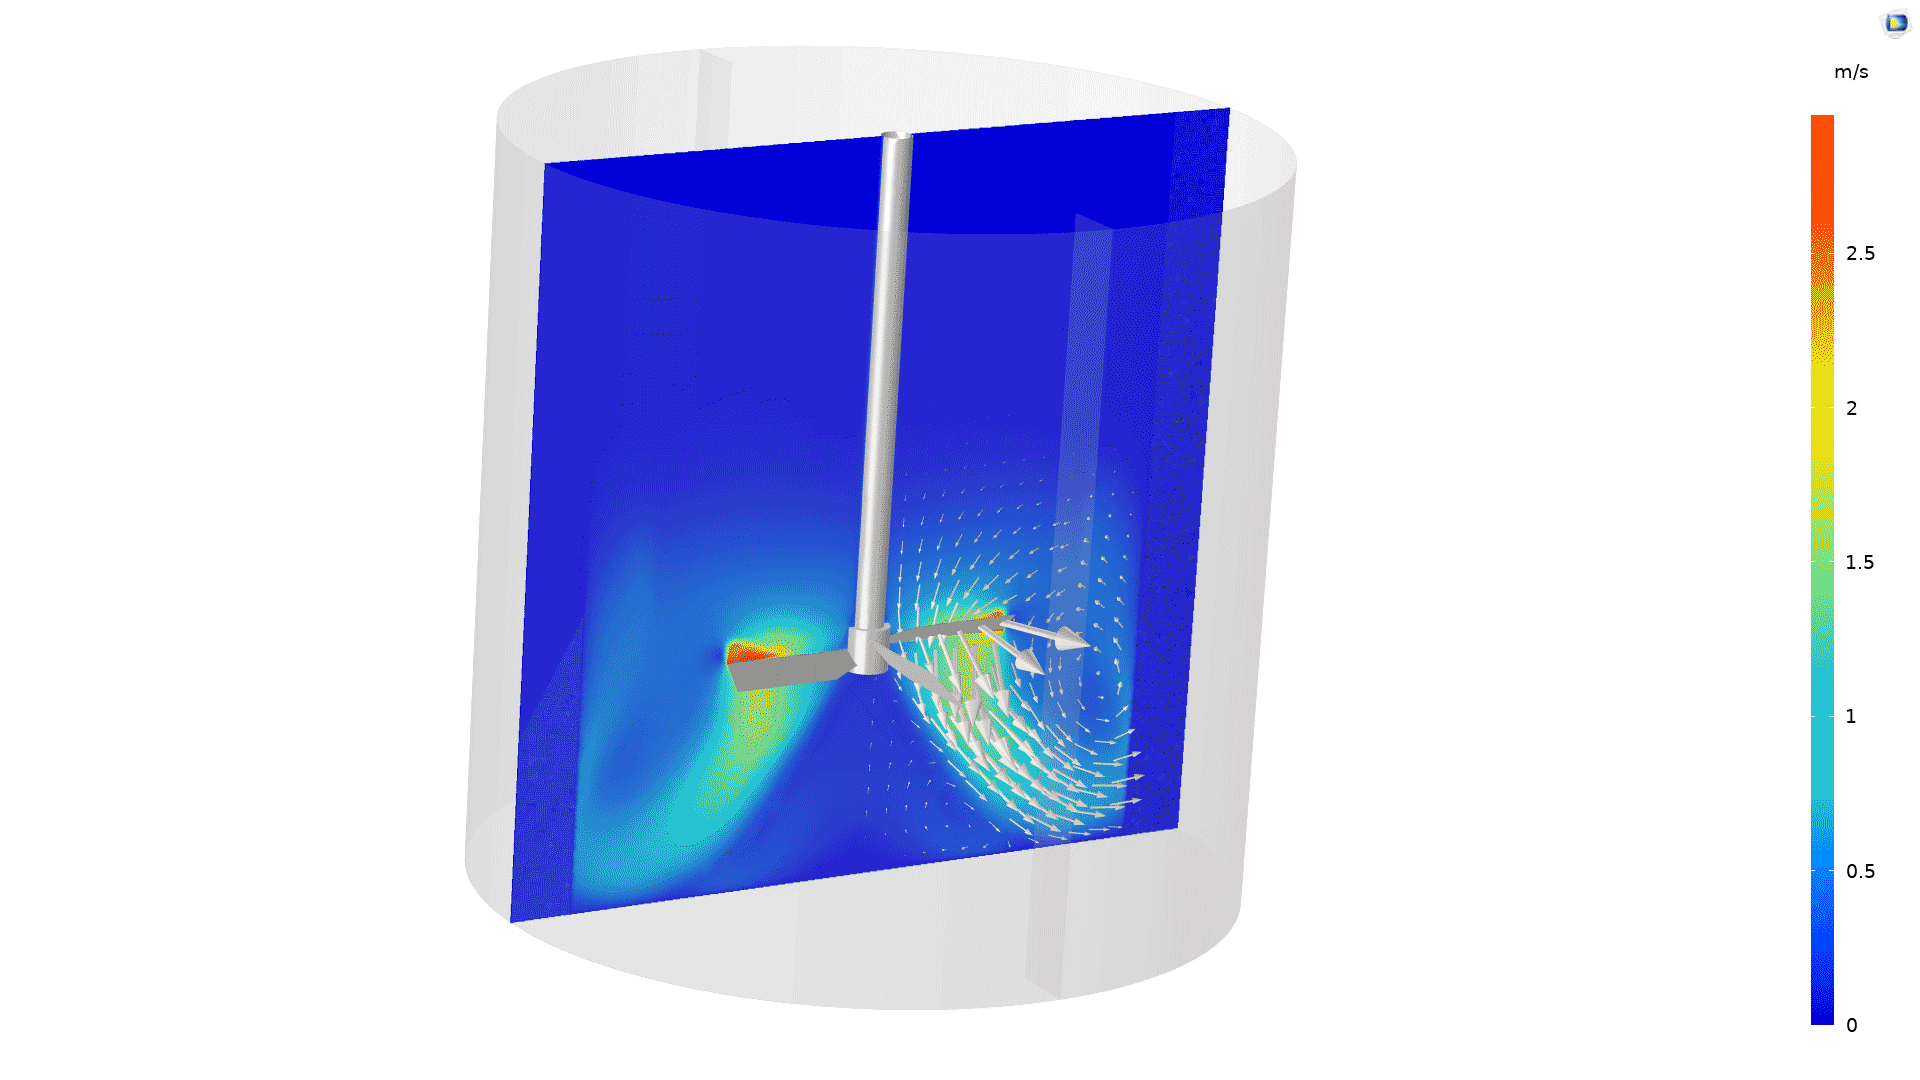 Power Law 모델로 모델링된 콜로이드 현탁액. 임펠러에서 멀어지면 점도가 극적으로 증가하여 믹서에서 매우 좋지 않은 혼합 성능을 보여줍니다. 이 모델은 액체 표면에 더 가까운 두 번째 임펠러가 필요할 수 있음을 보여줍니다.